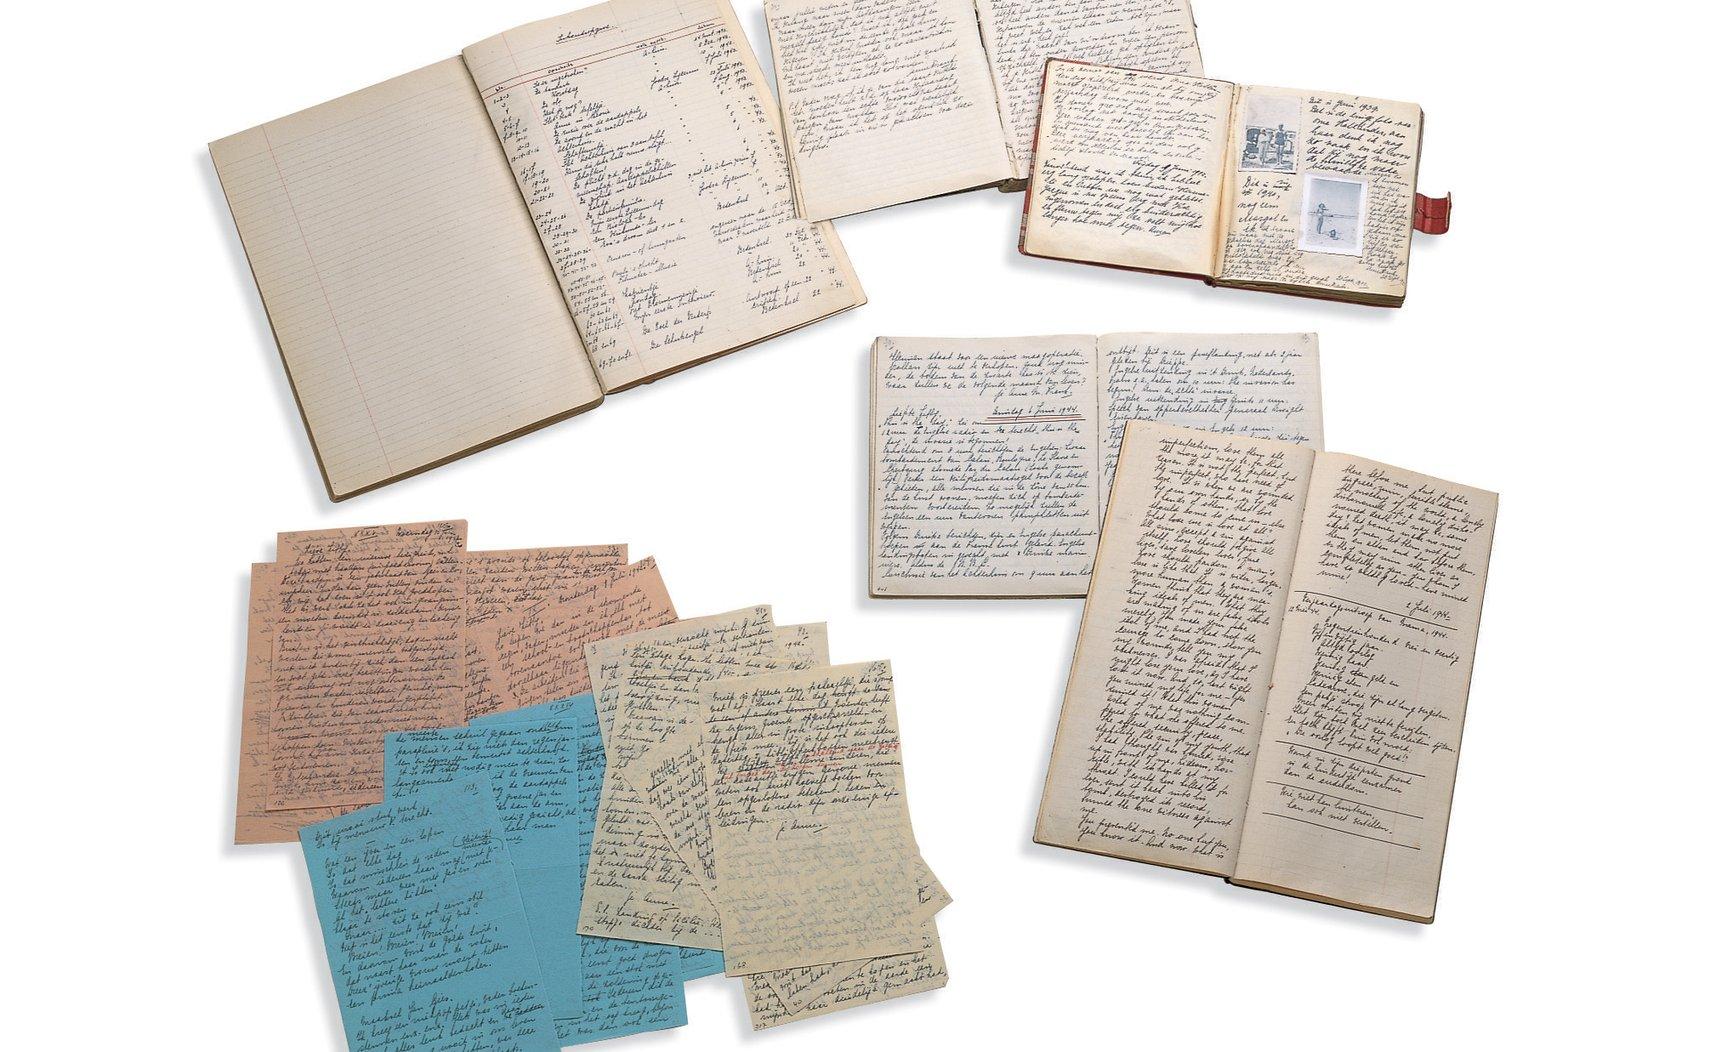 Manuscripten van Anne Frank